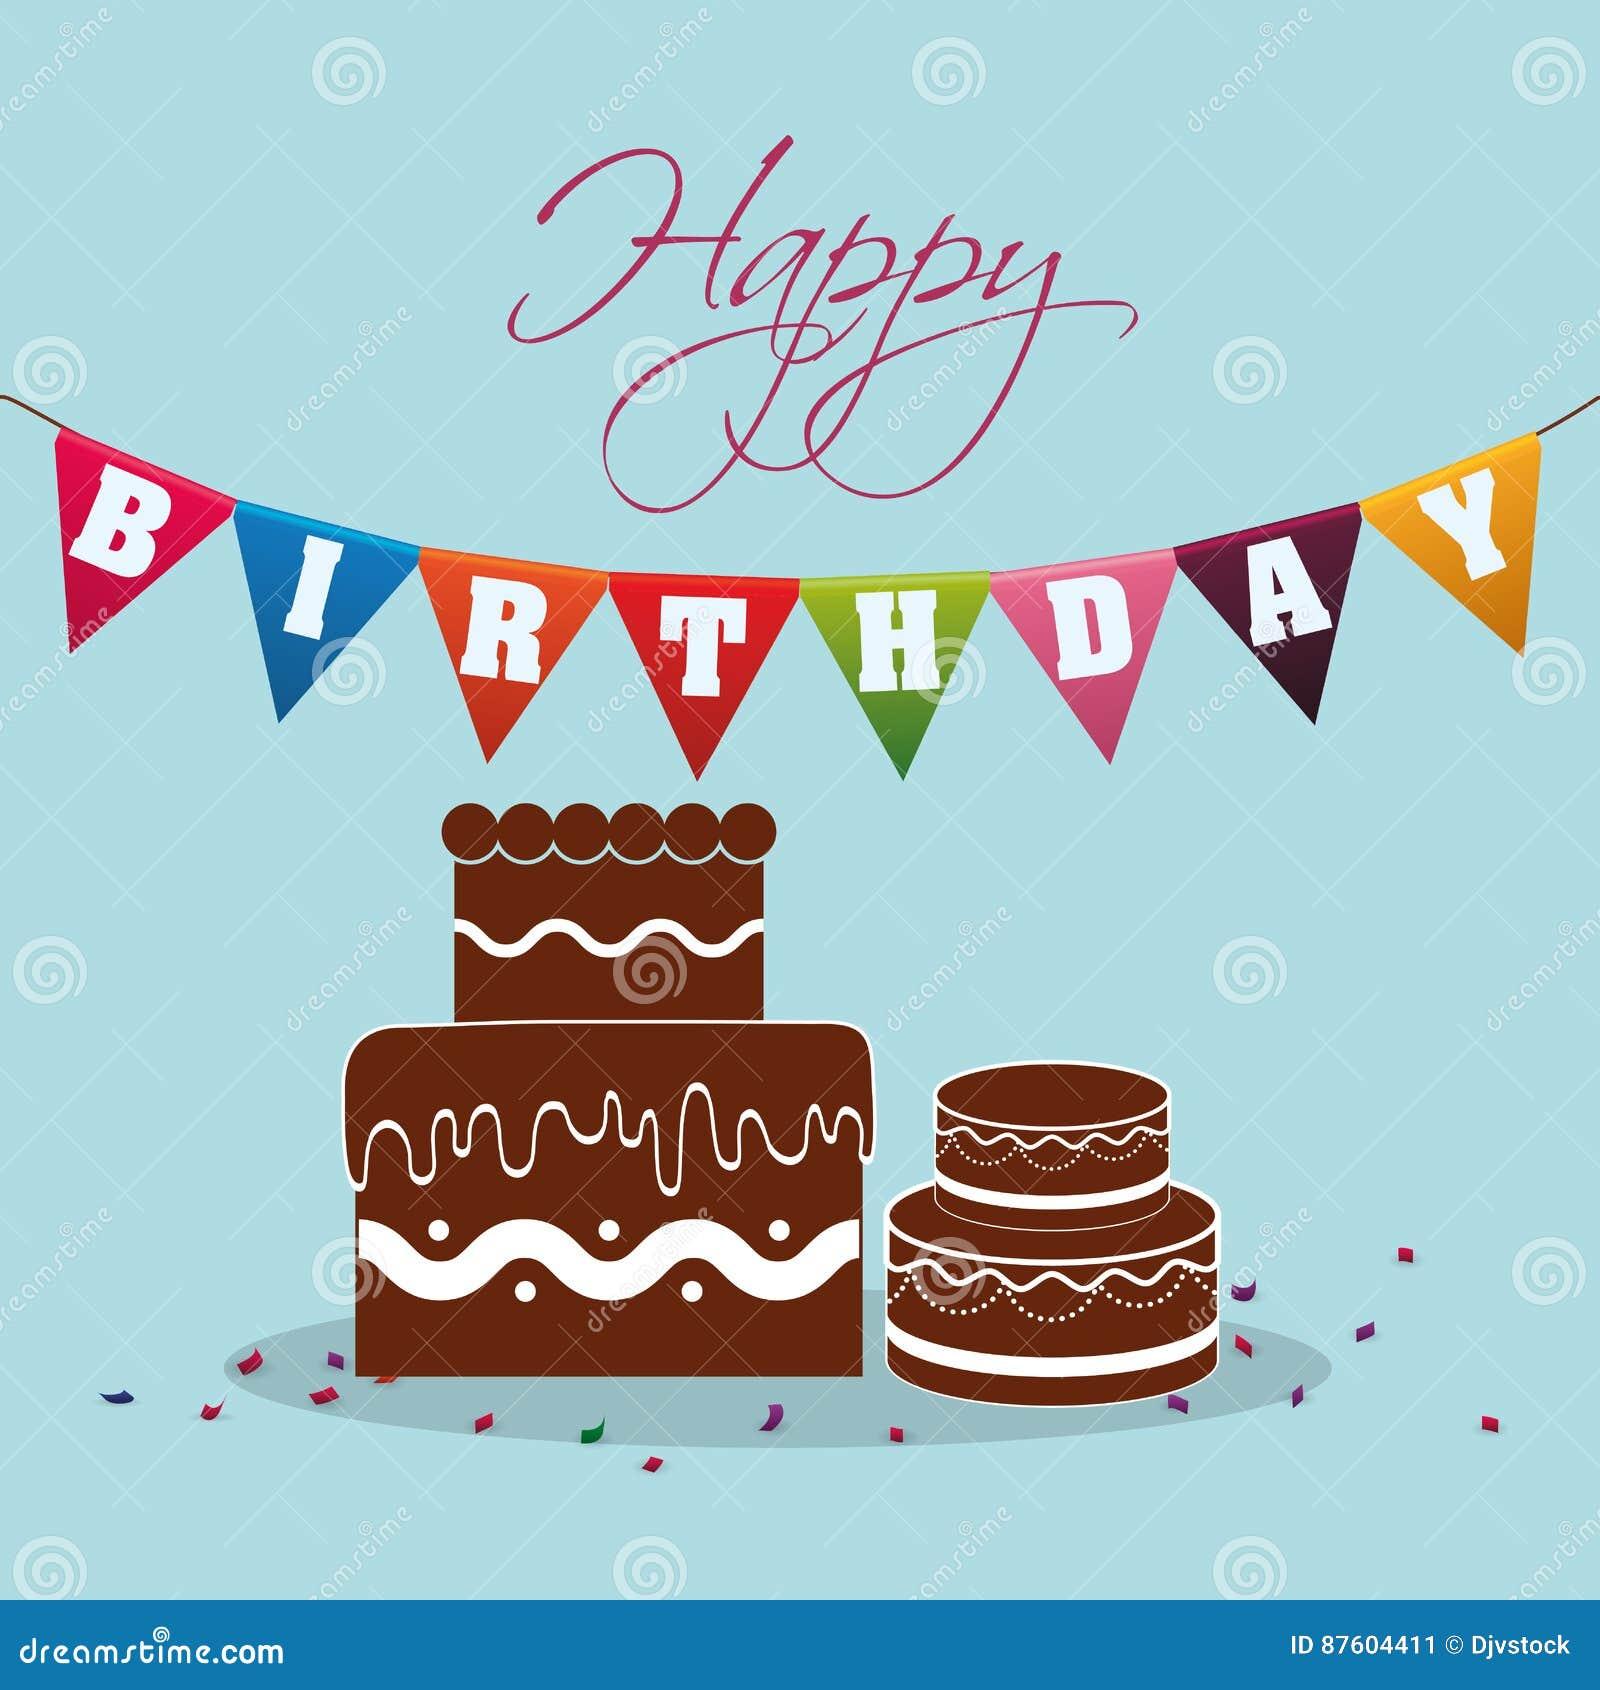 Miraculous Happy Birthday Chocolate Cake Pennant Festive Stock Illustration Birthday Cards Printable Opercafe Filternl